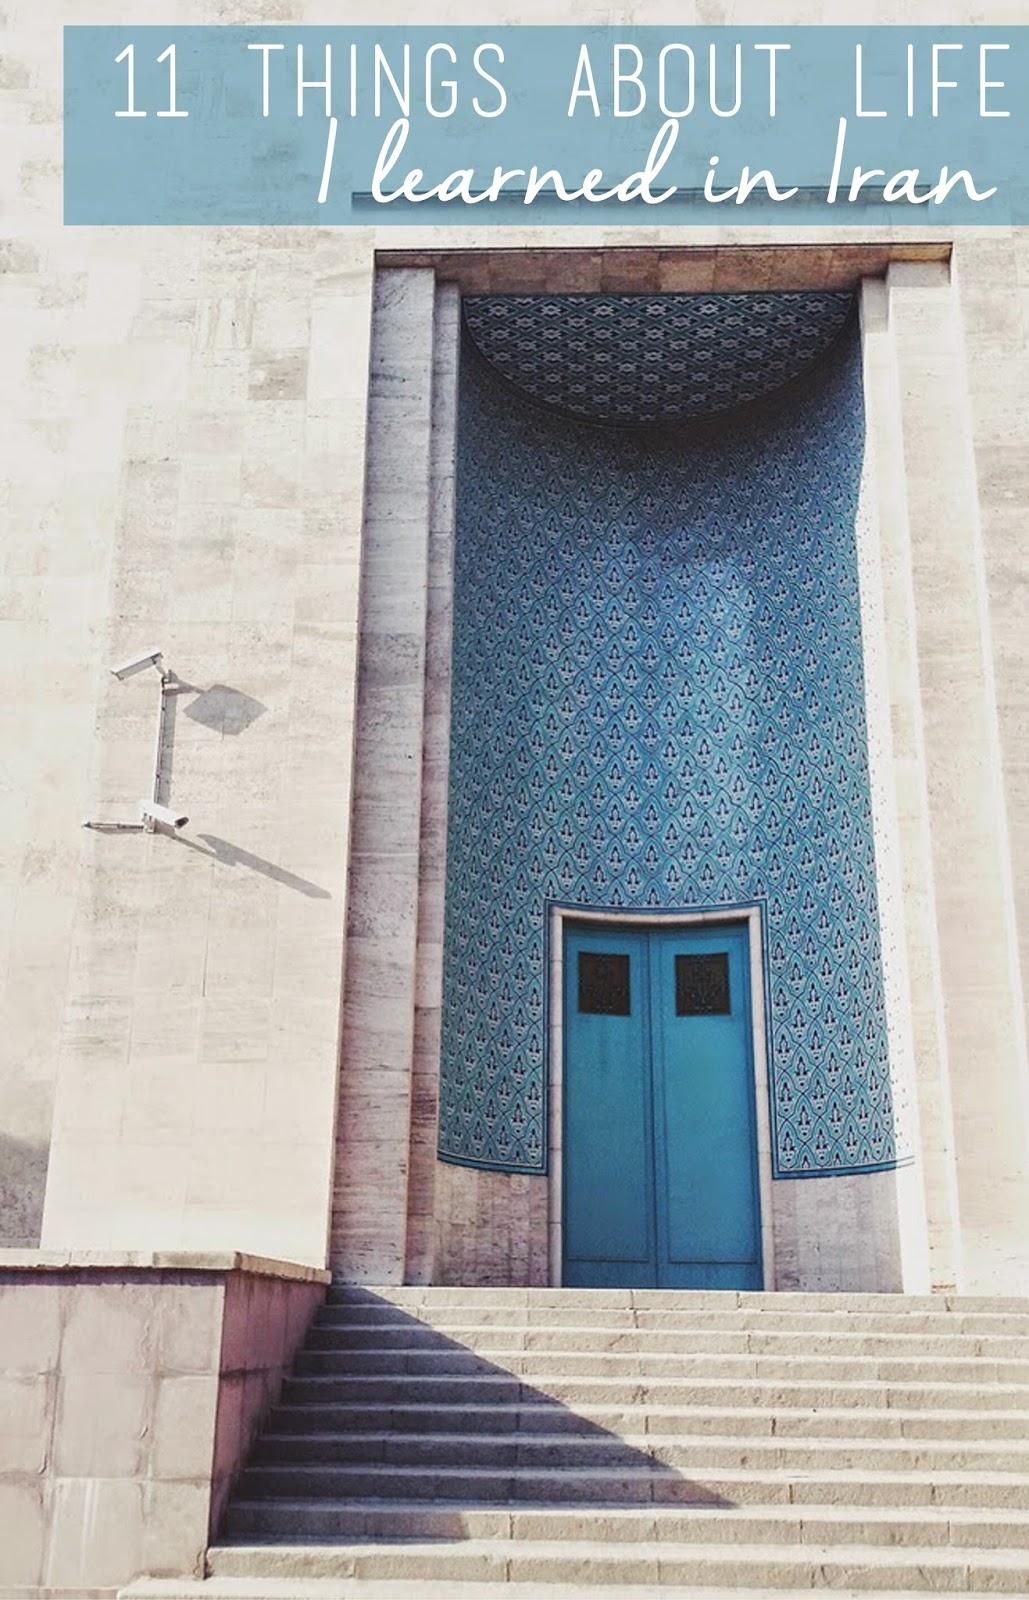 tehran, iran, iranian architecture, bank meli tehran, minimalist architecture